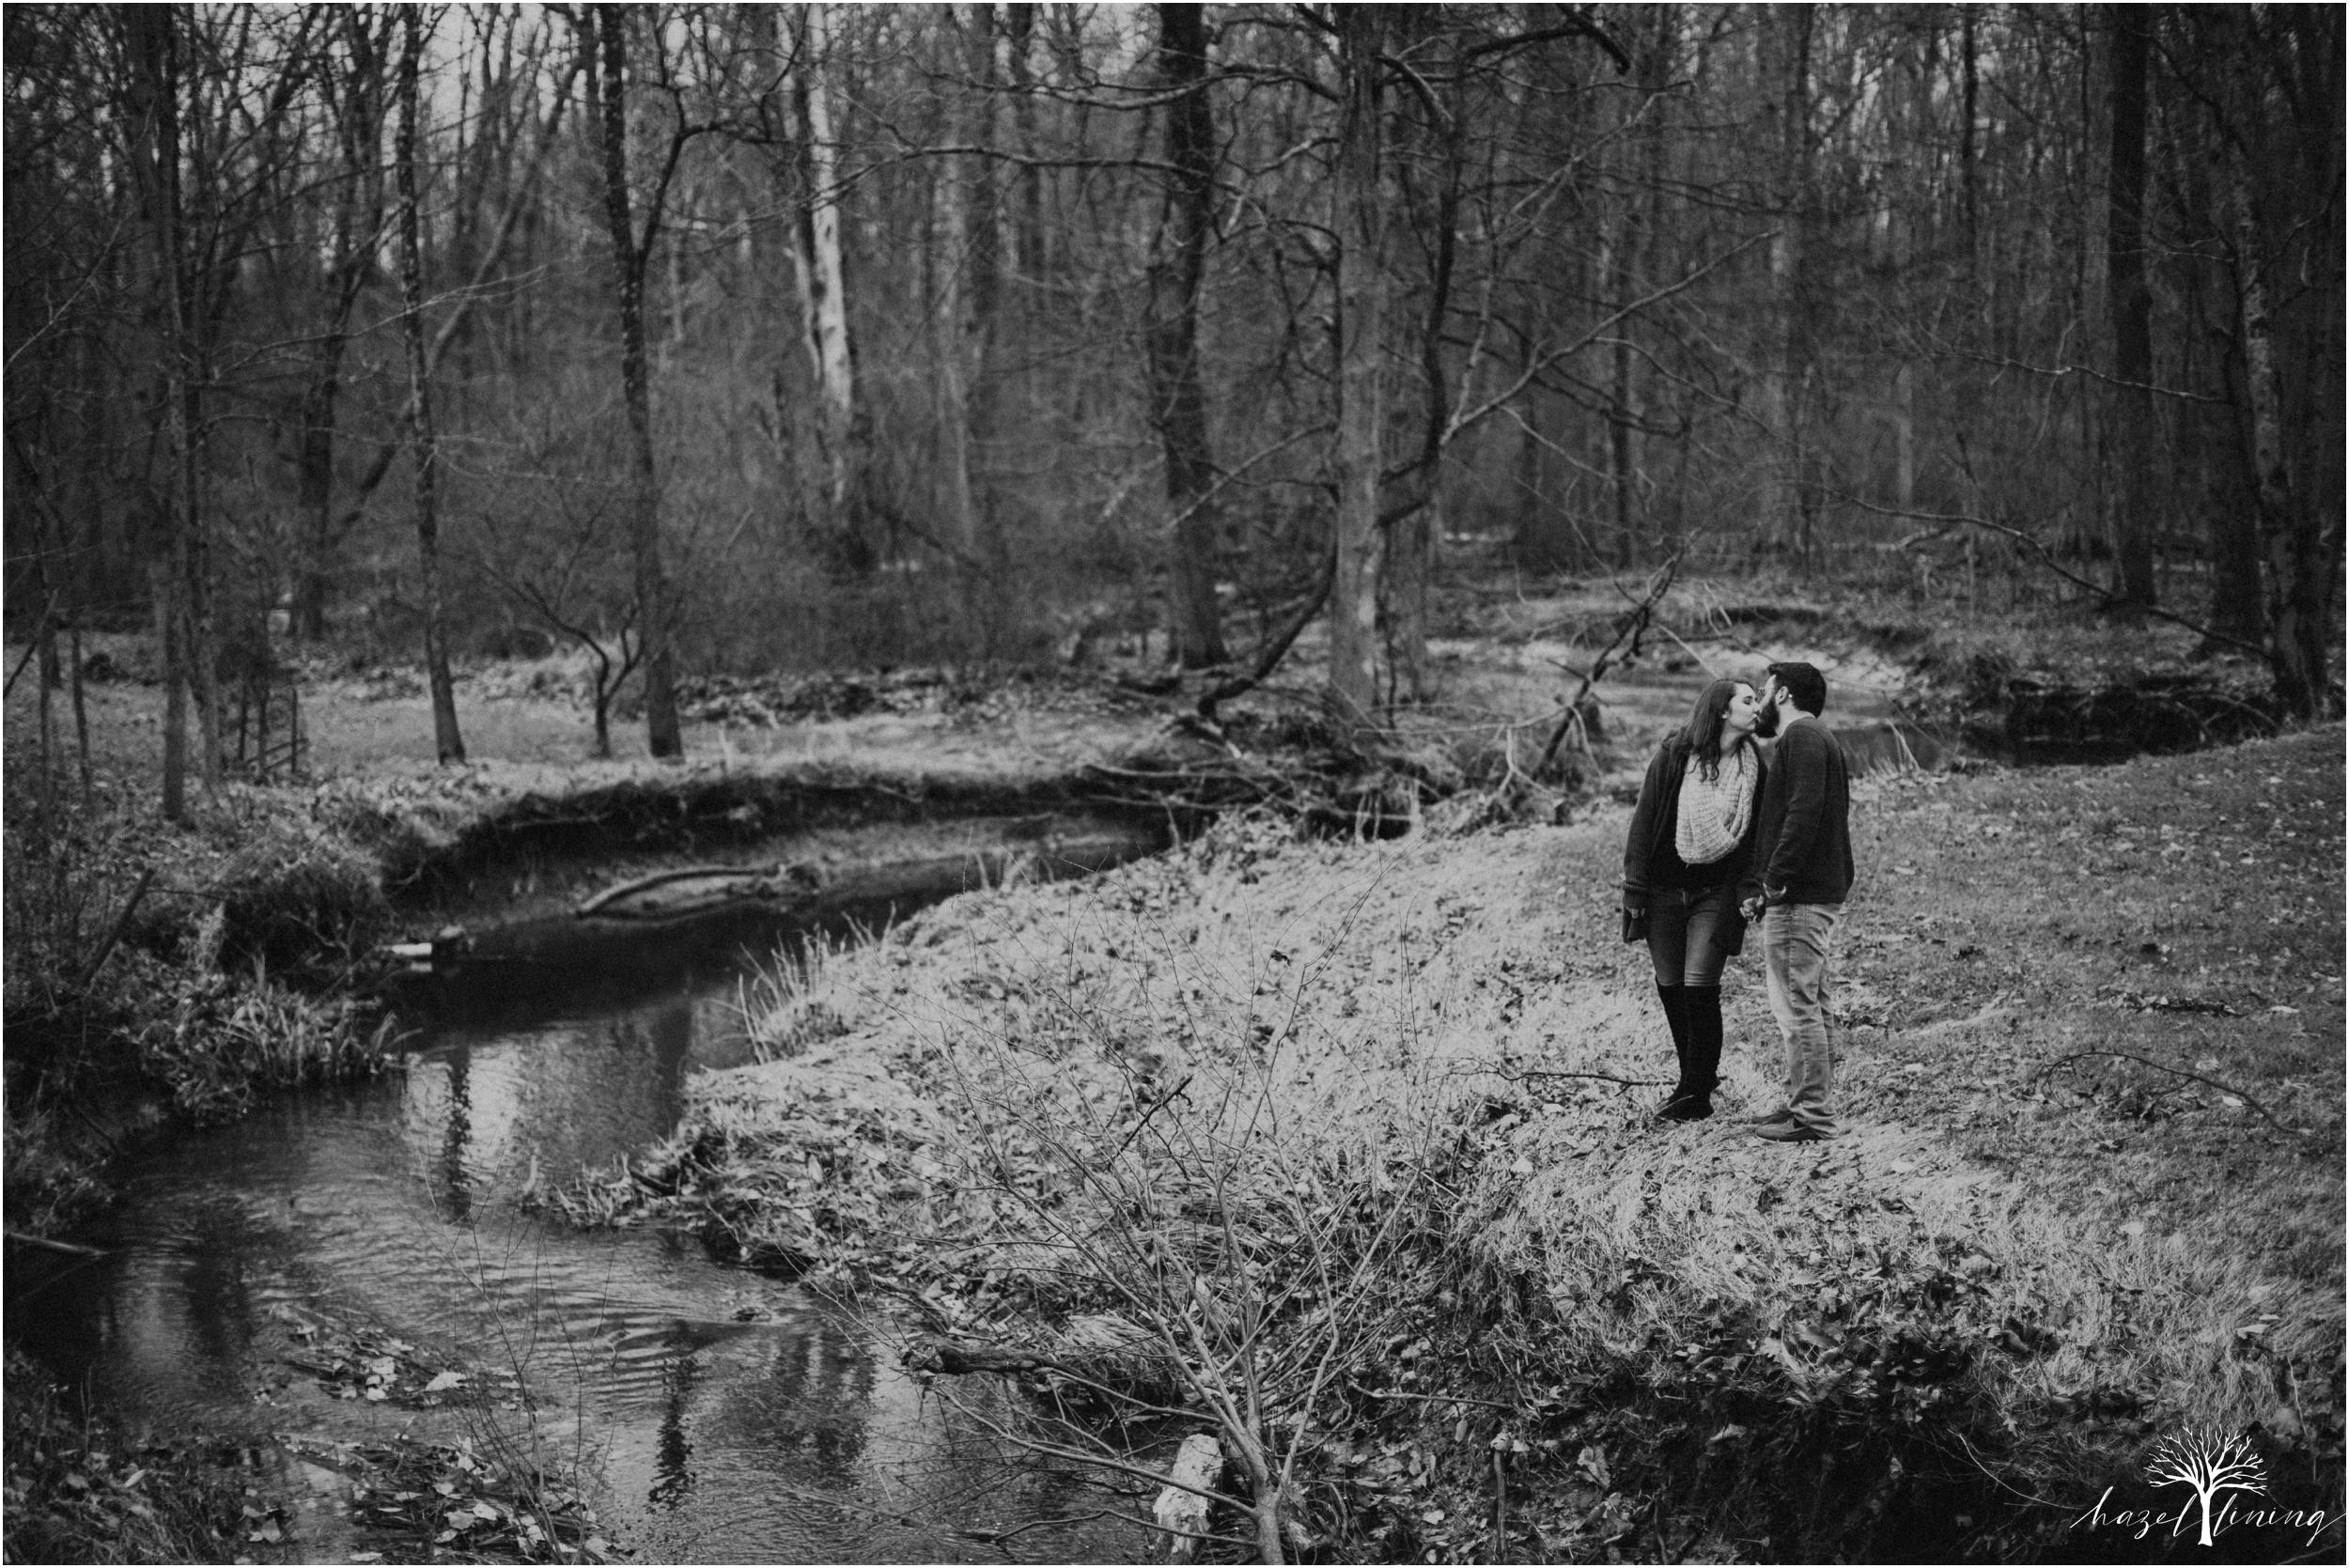 evan-maggie-lesh-one-year-anniversary-winter-shoot-camp-menolan-pennsylvania_0032.jpg